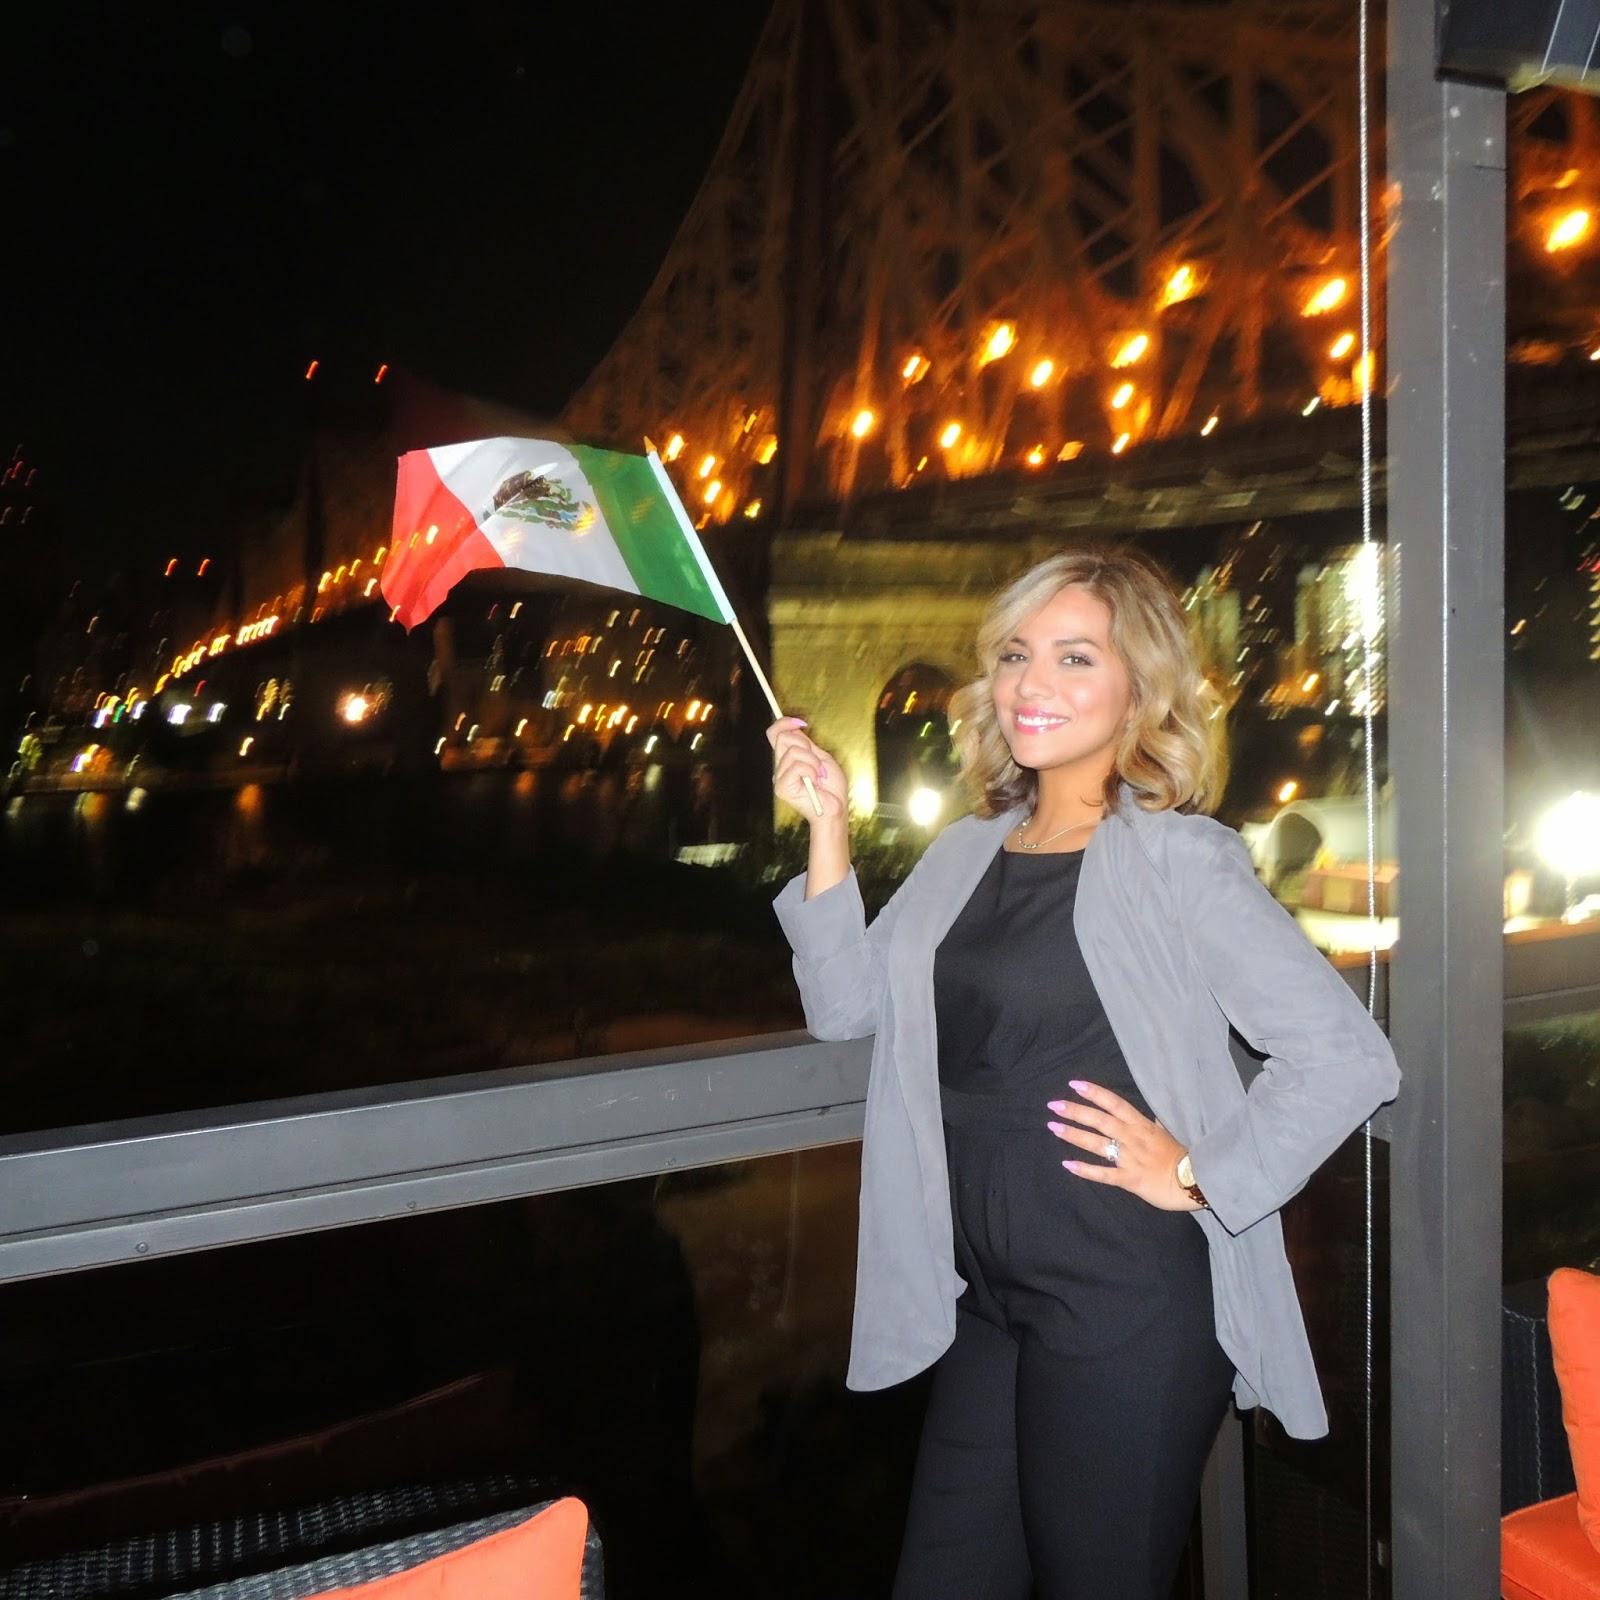 Viva Mexico and Hispanic Heritage Month